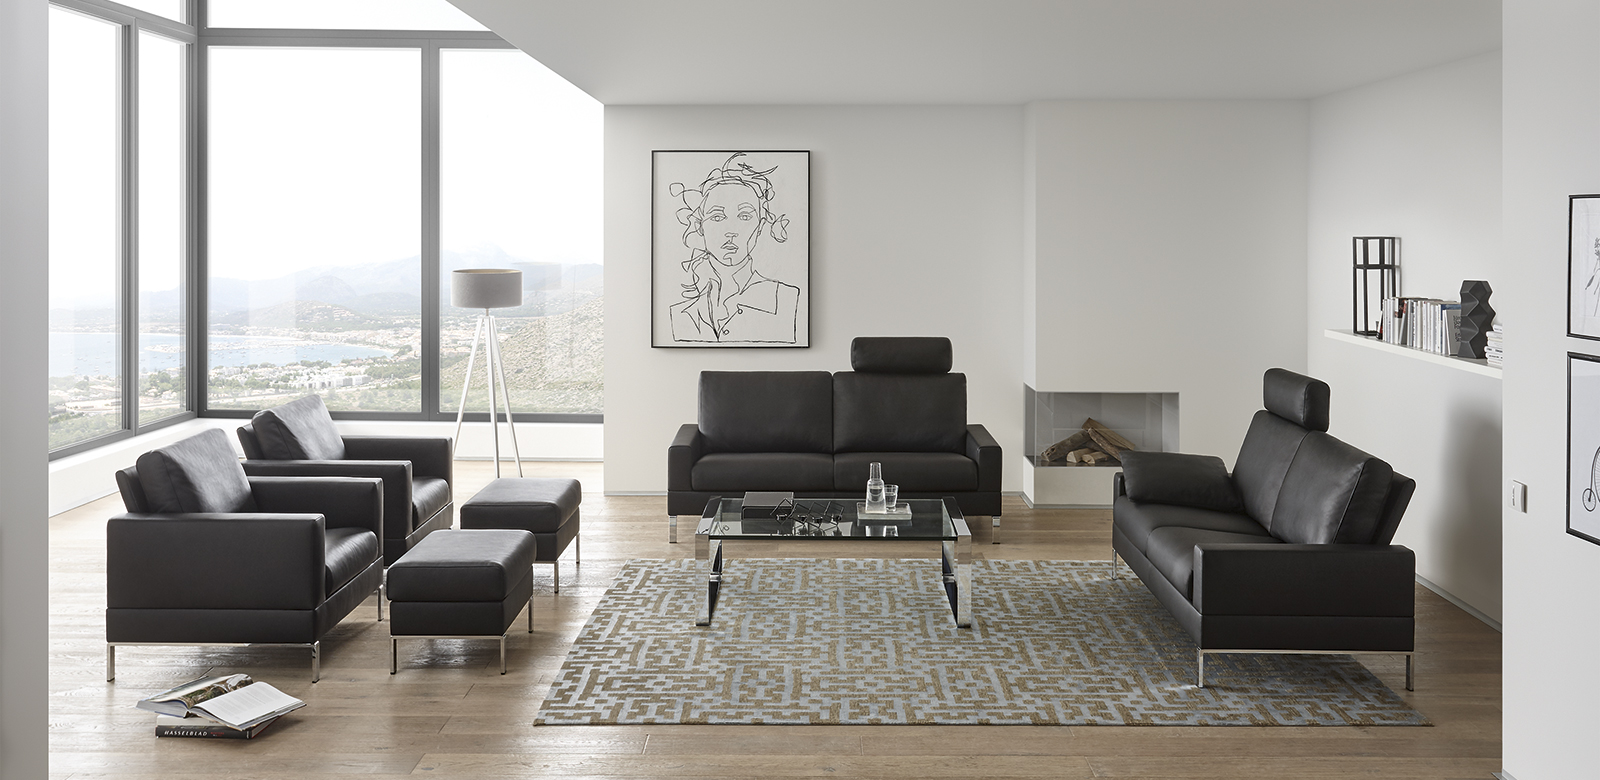 Full Size of Erpo Sofa überzug Lederpflege Polster Weißes Franz Fertig Relaxfunktion Grau Weiß Blau Federkern Karup Sofa Erpo Sofa